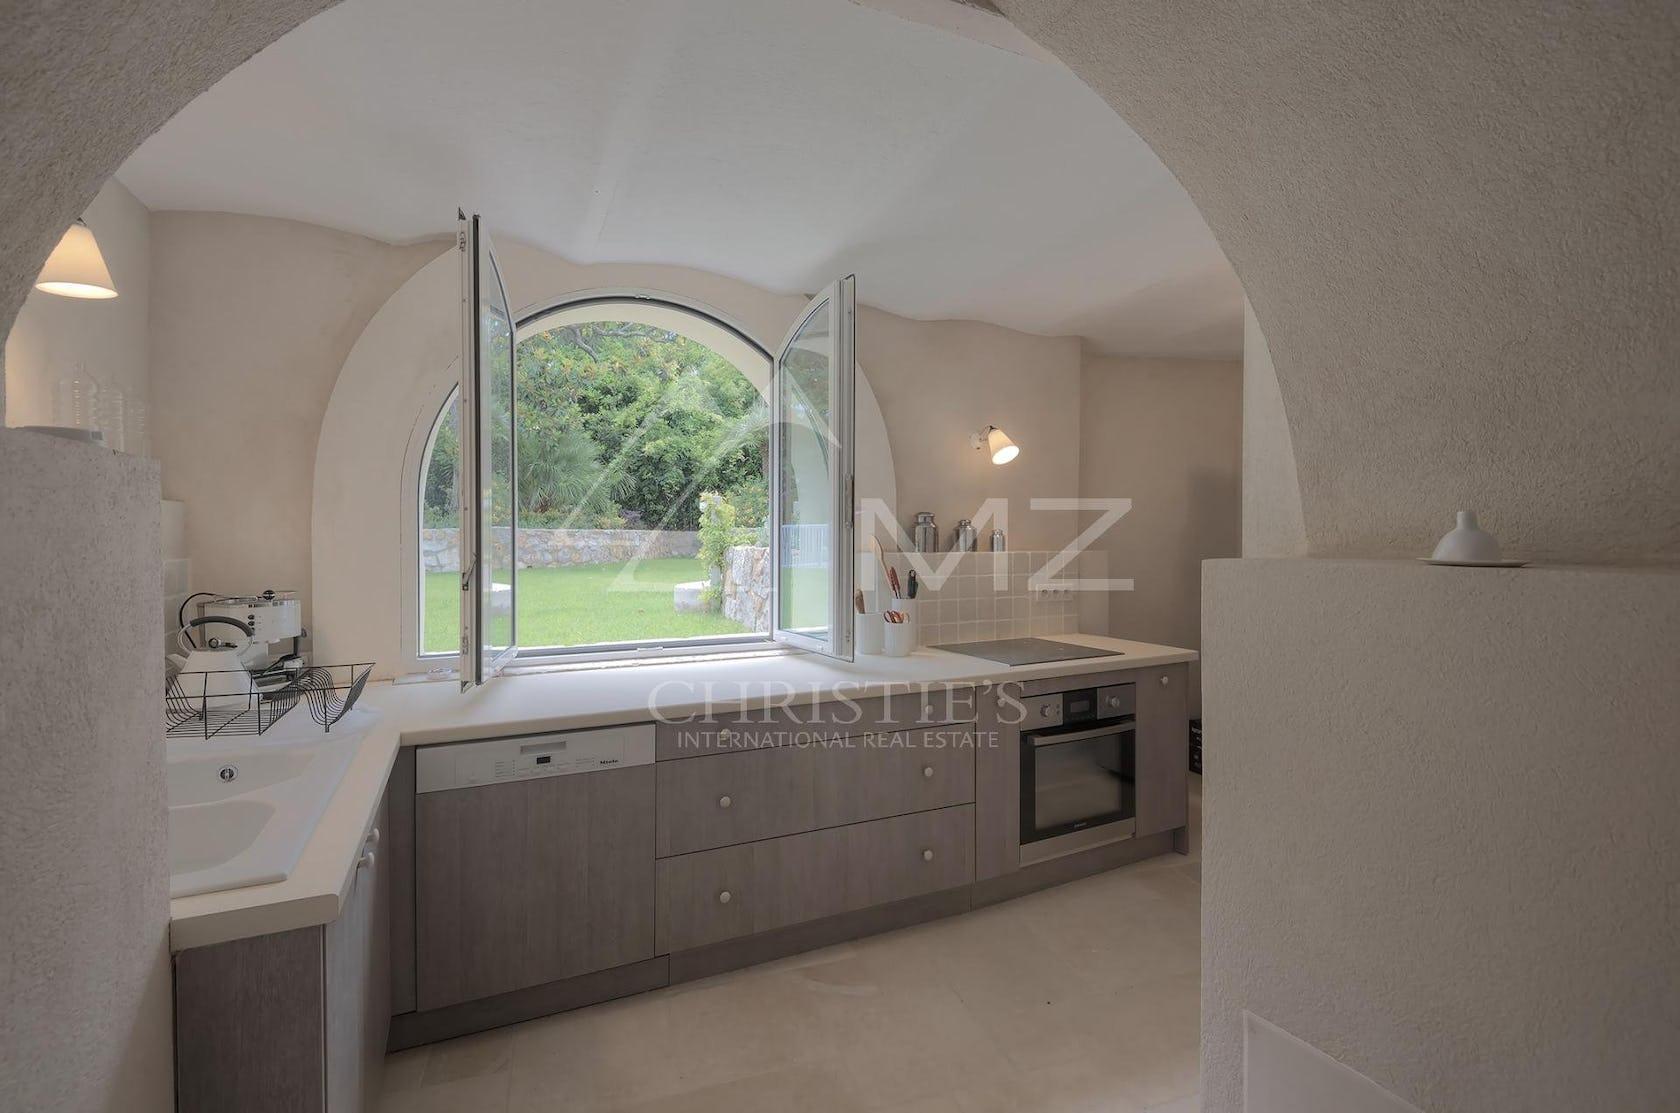 room indoors interior design kitchen